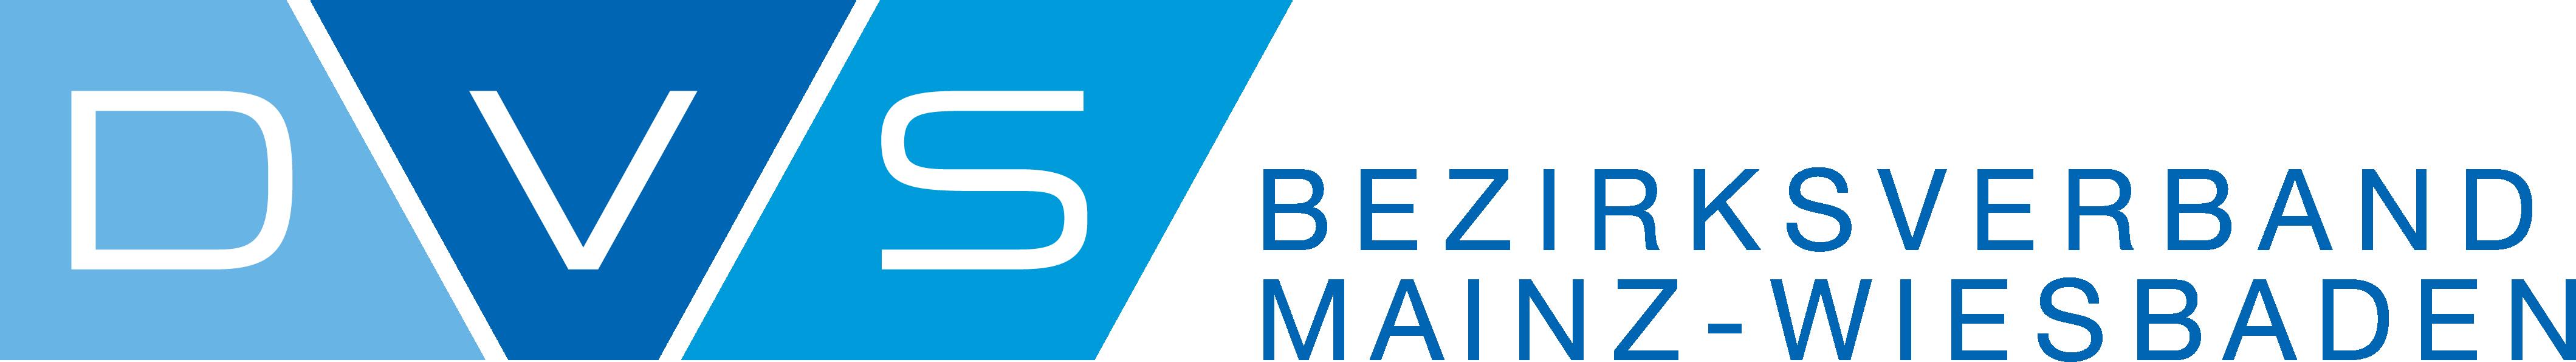 DVS-Bezirksverband Mainz — Wiesbaden